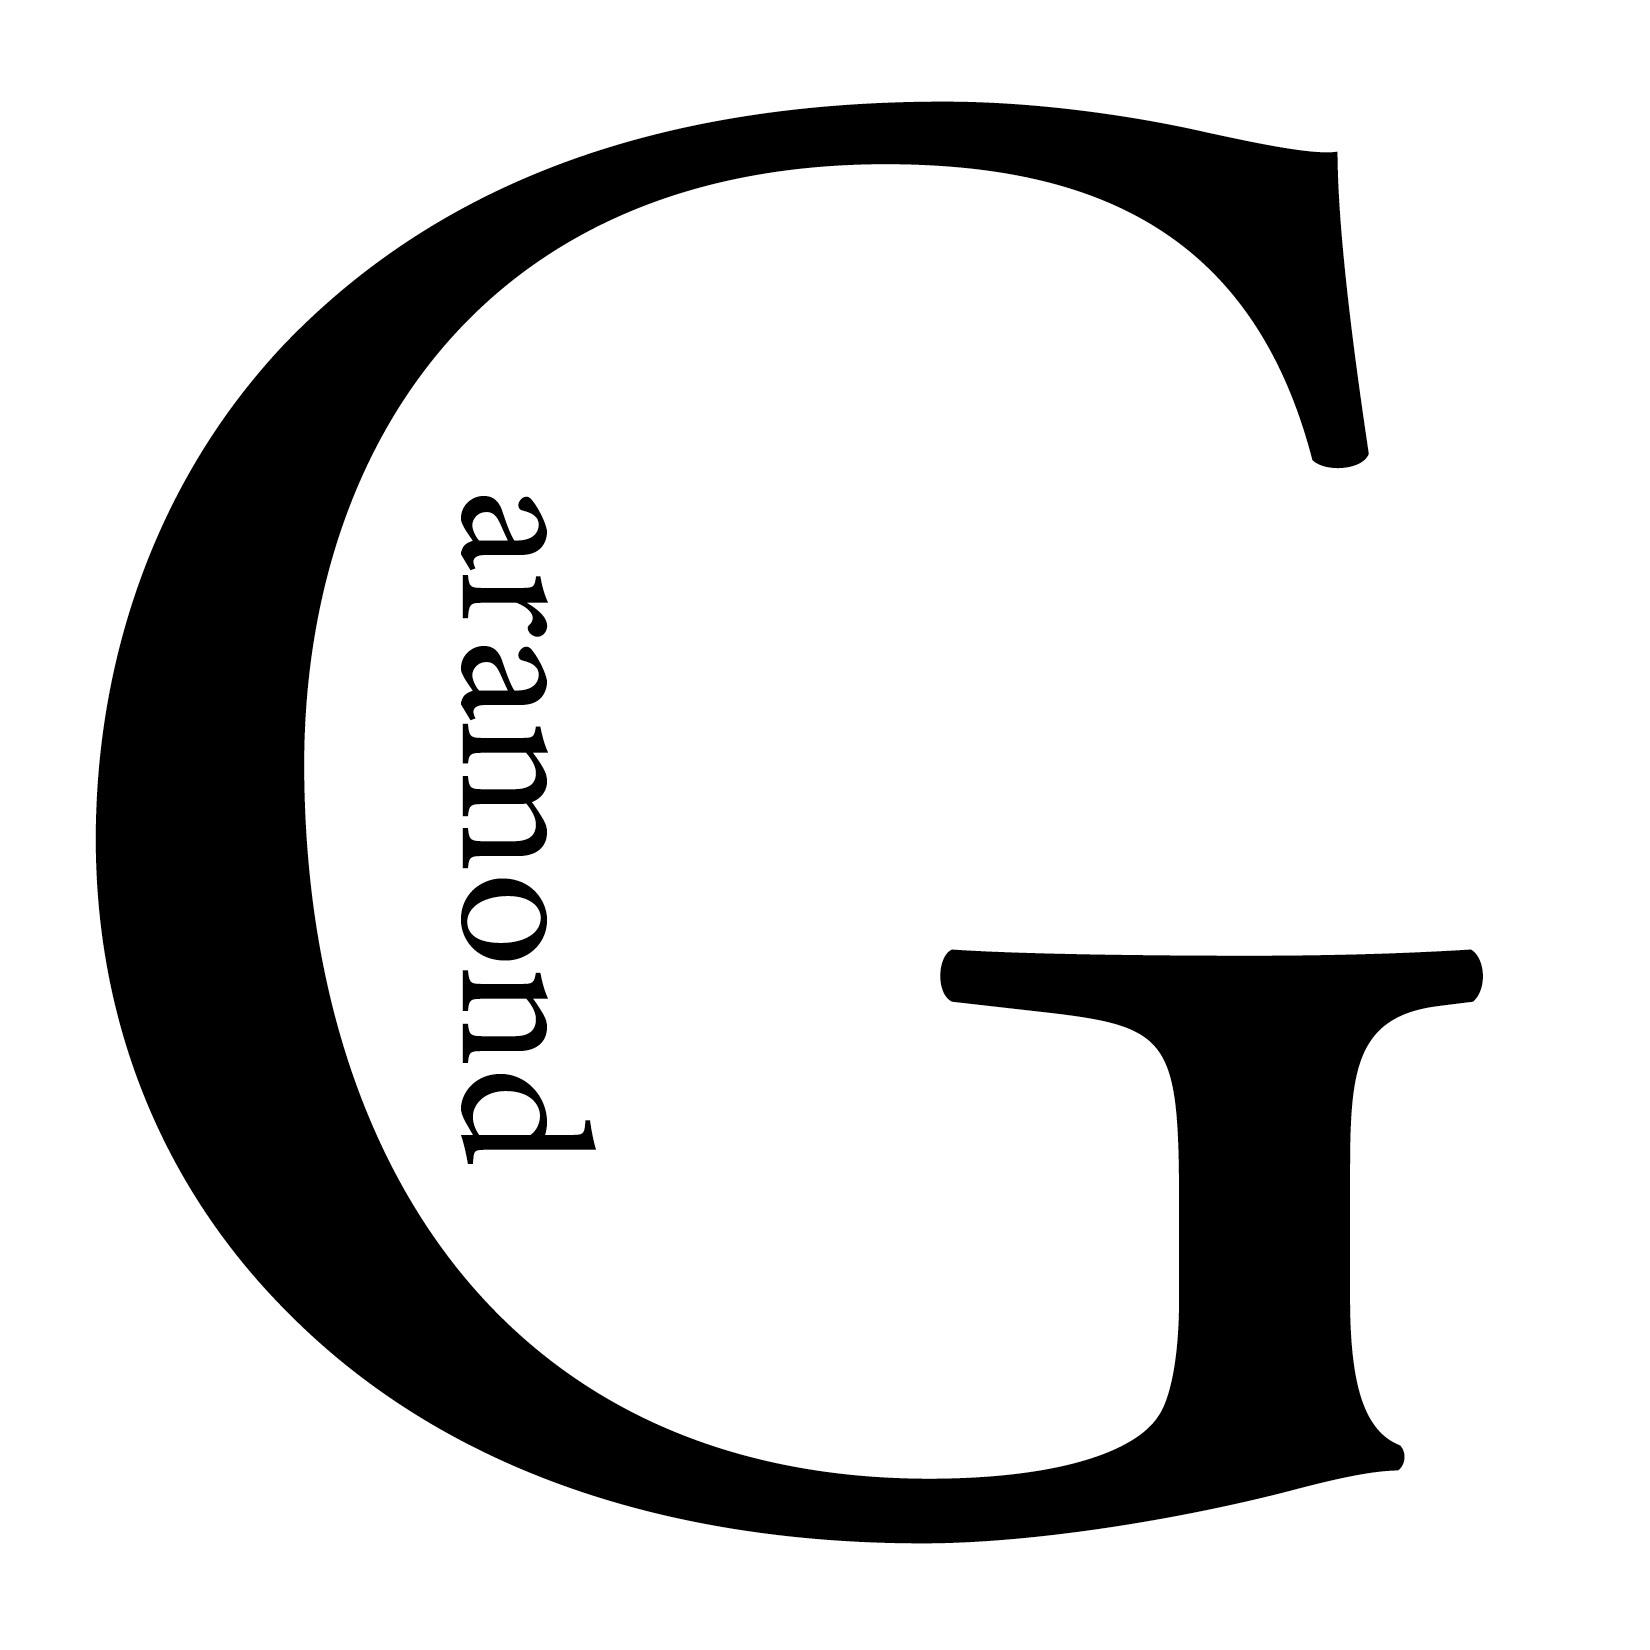 Robertson Final Typebook